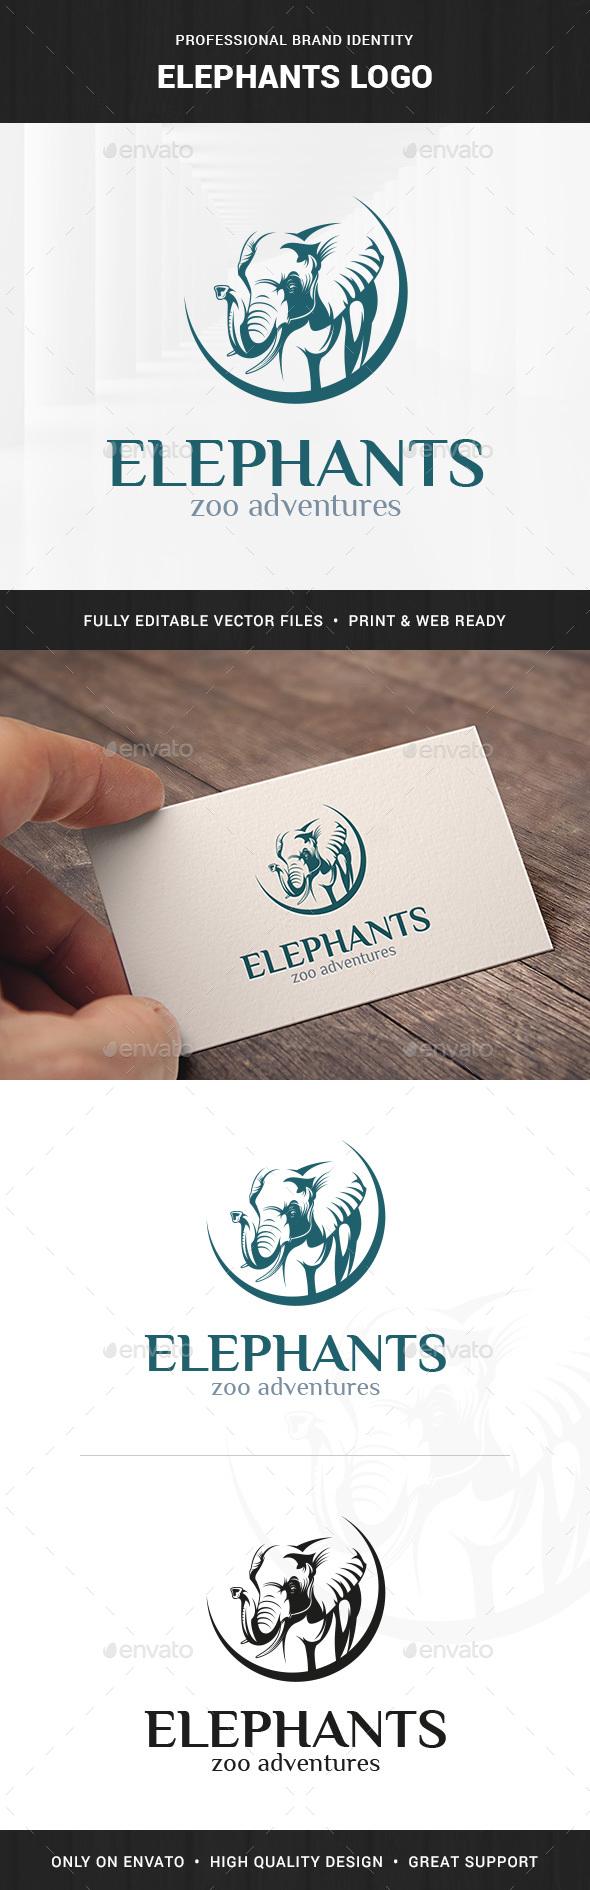 Elephants Logo Template